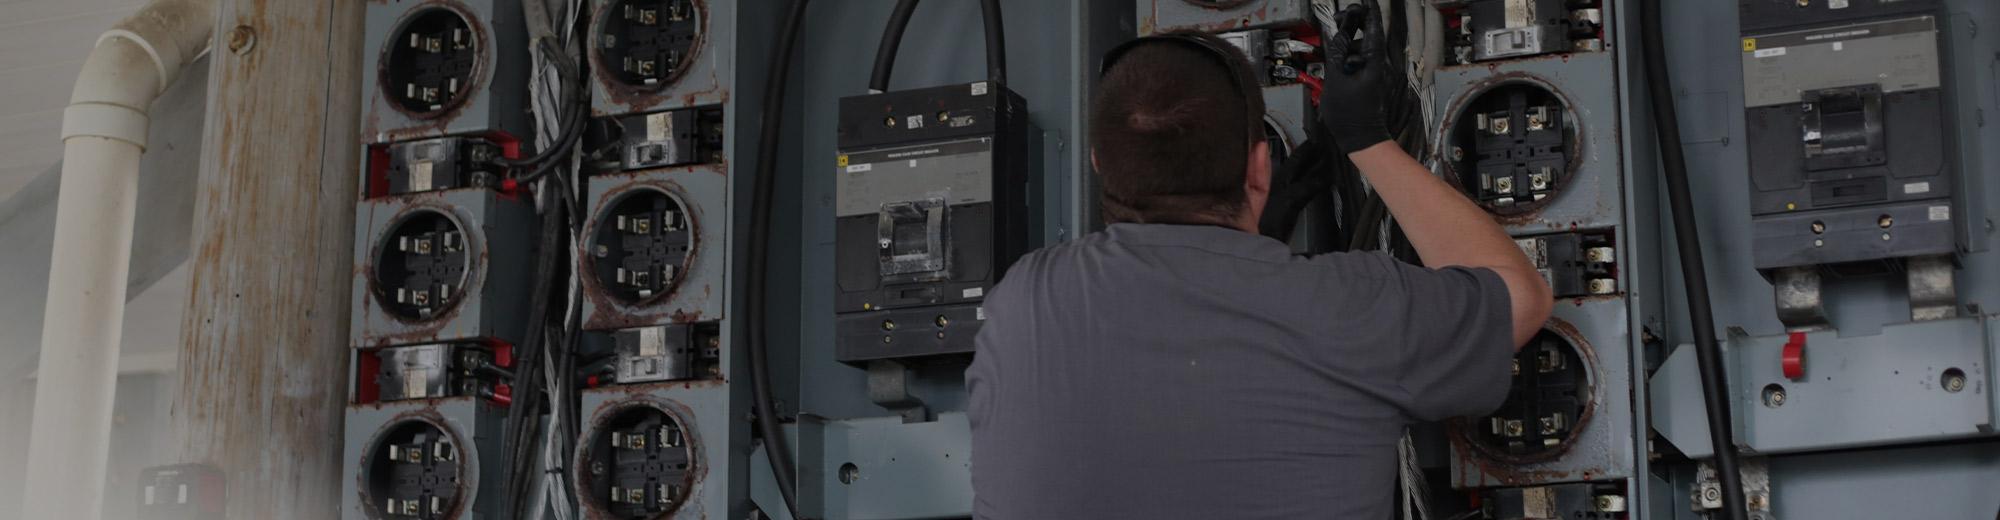 Commercial Electricians Myrtle Beach